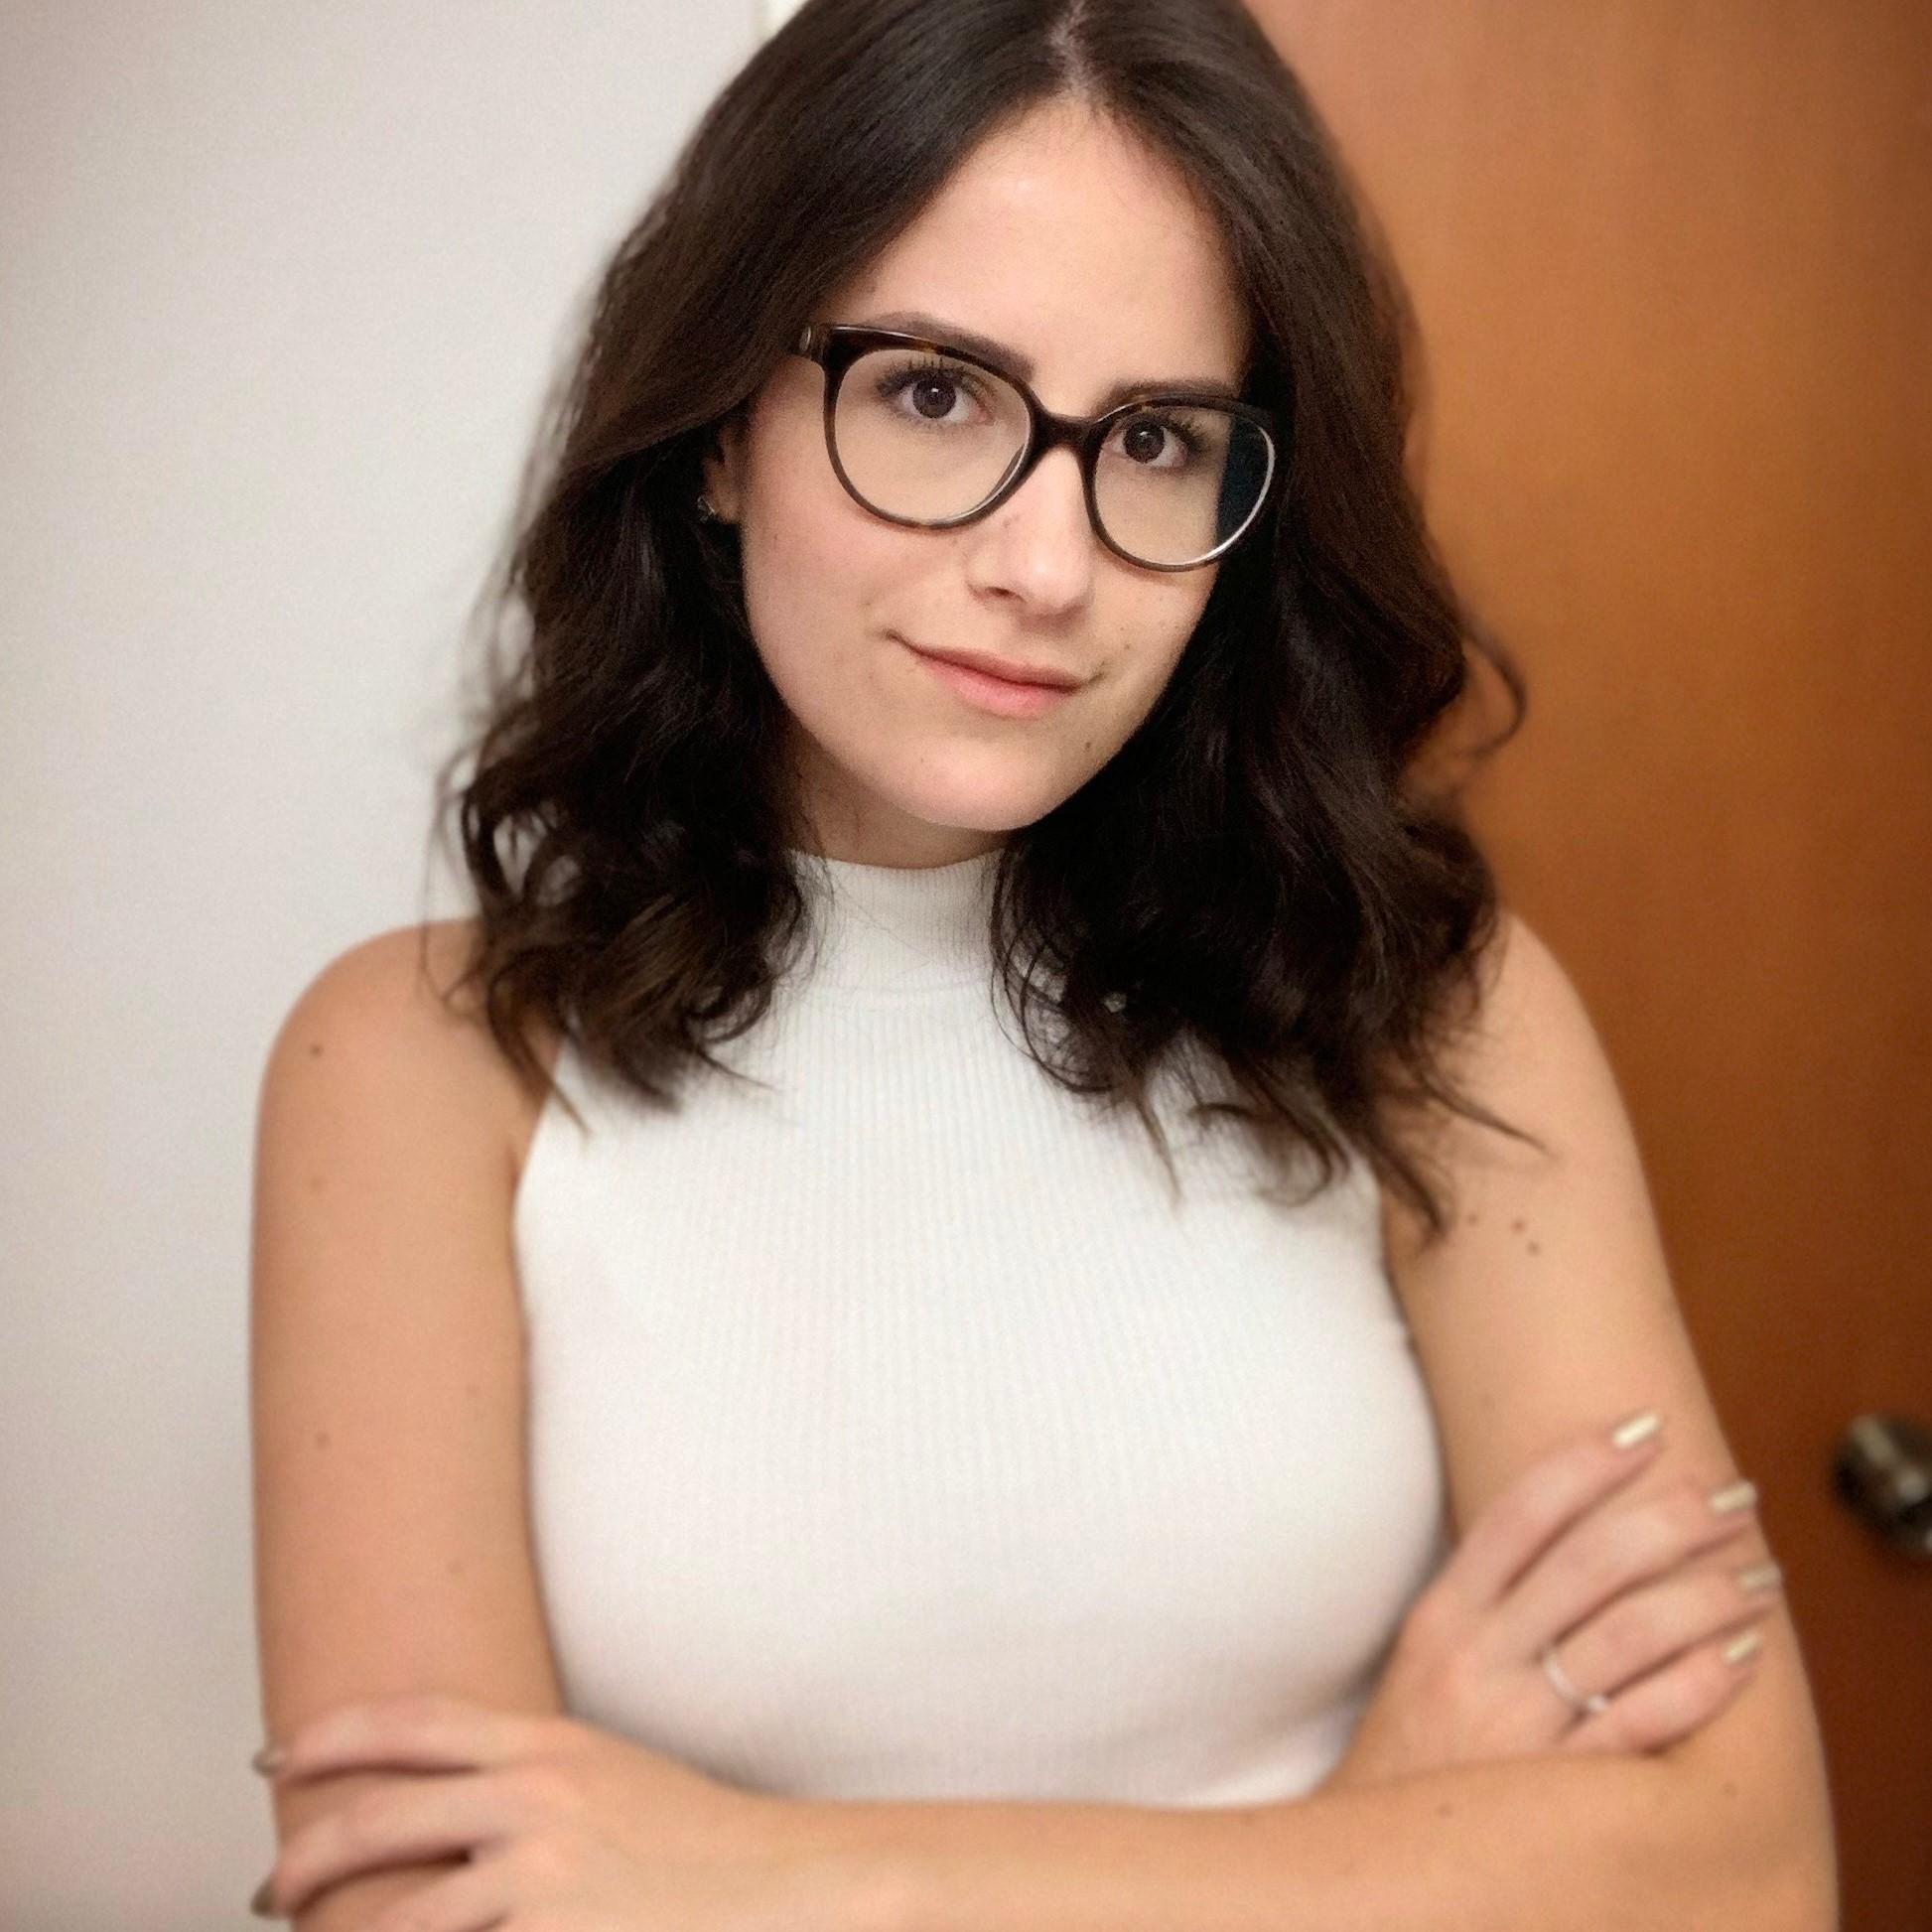 Paula Vier